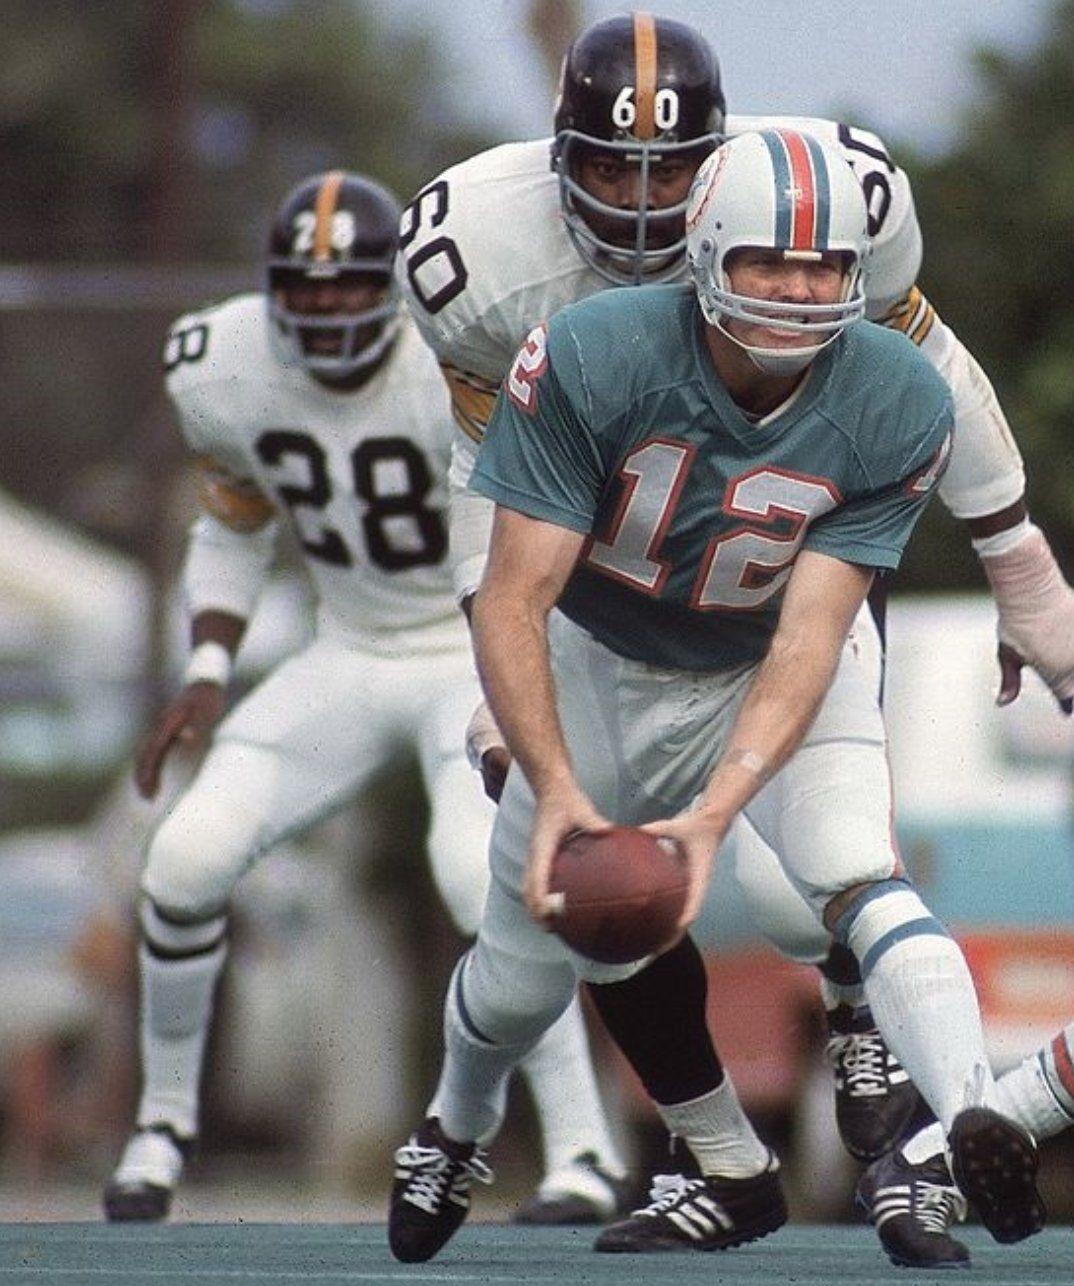 1970s NFL on | Nfl football players, Nfl, Football